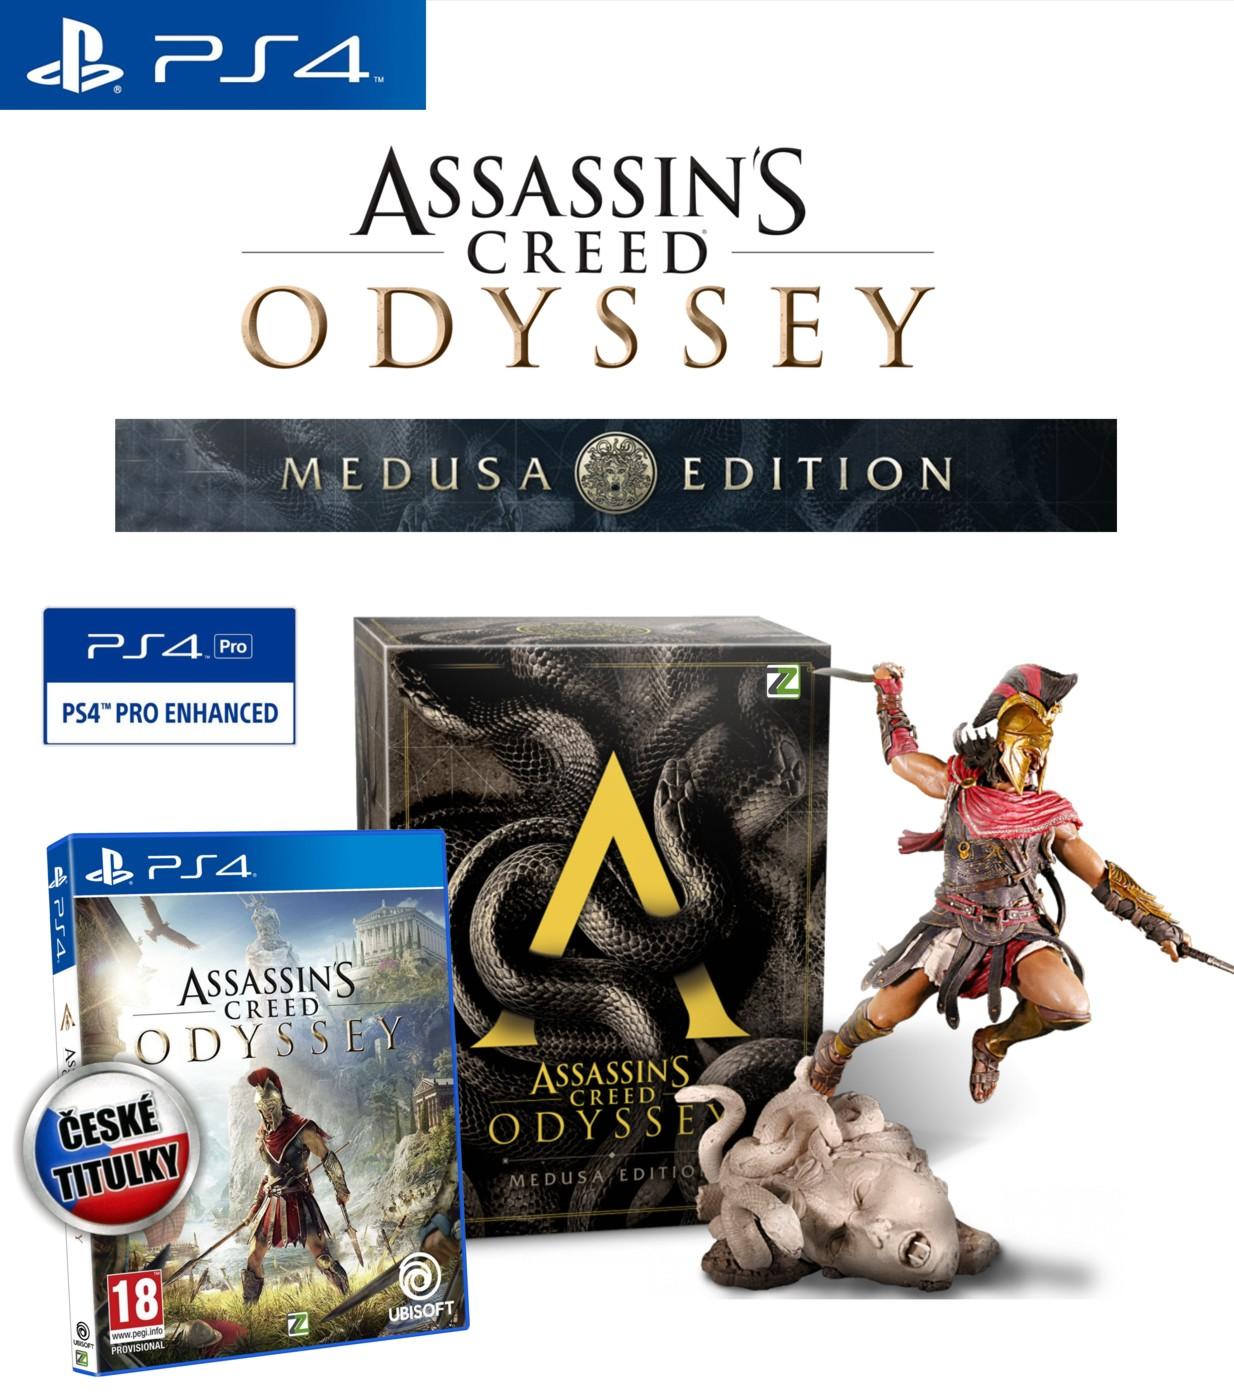 Assassin's Creed Odyssey: Medusa Edition - PS4